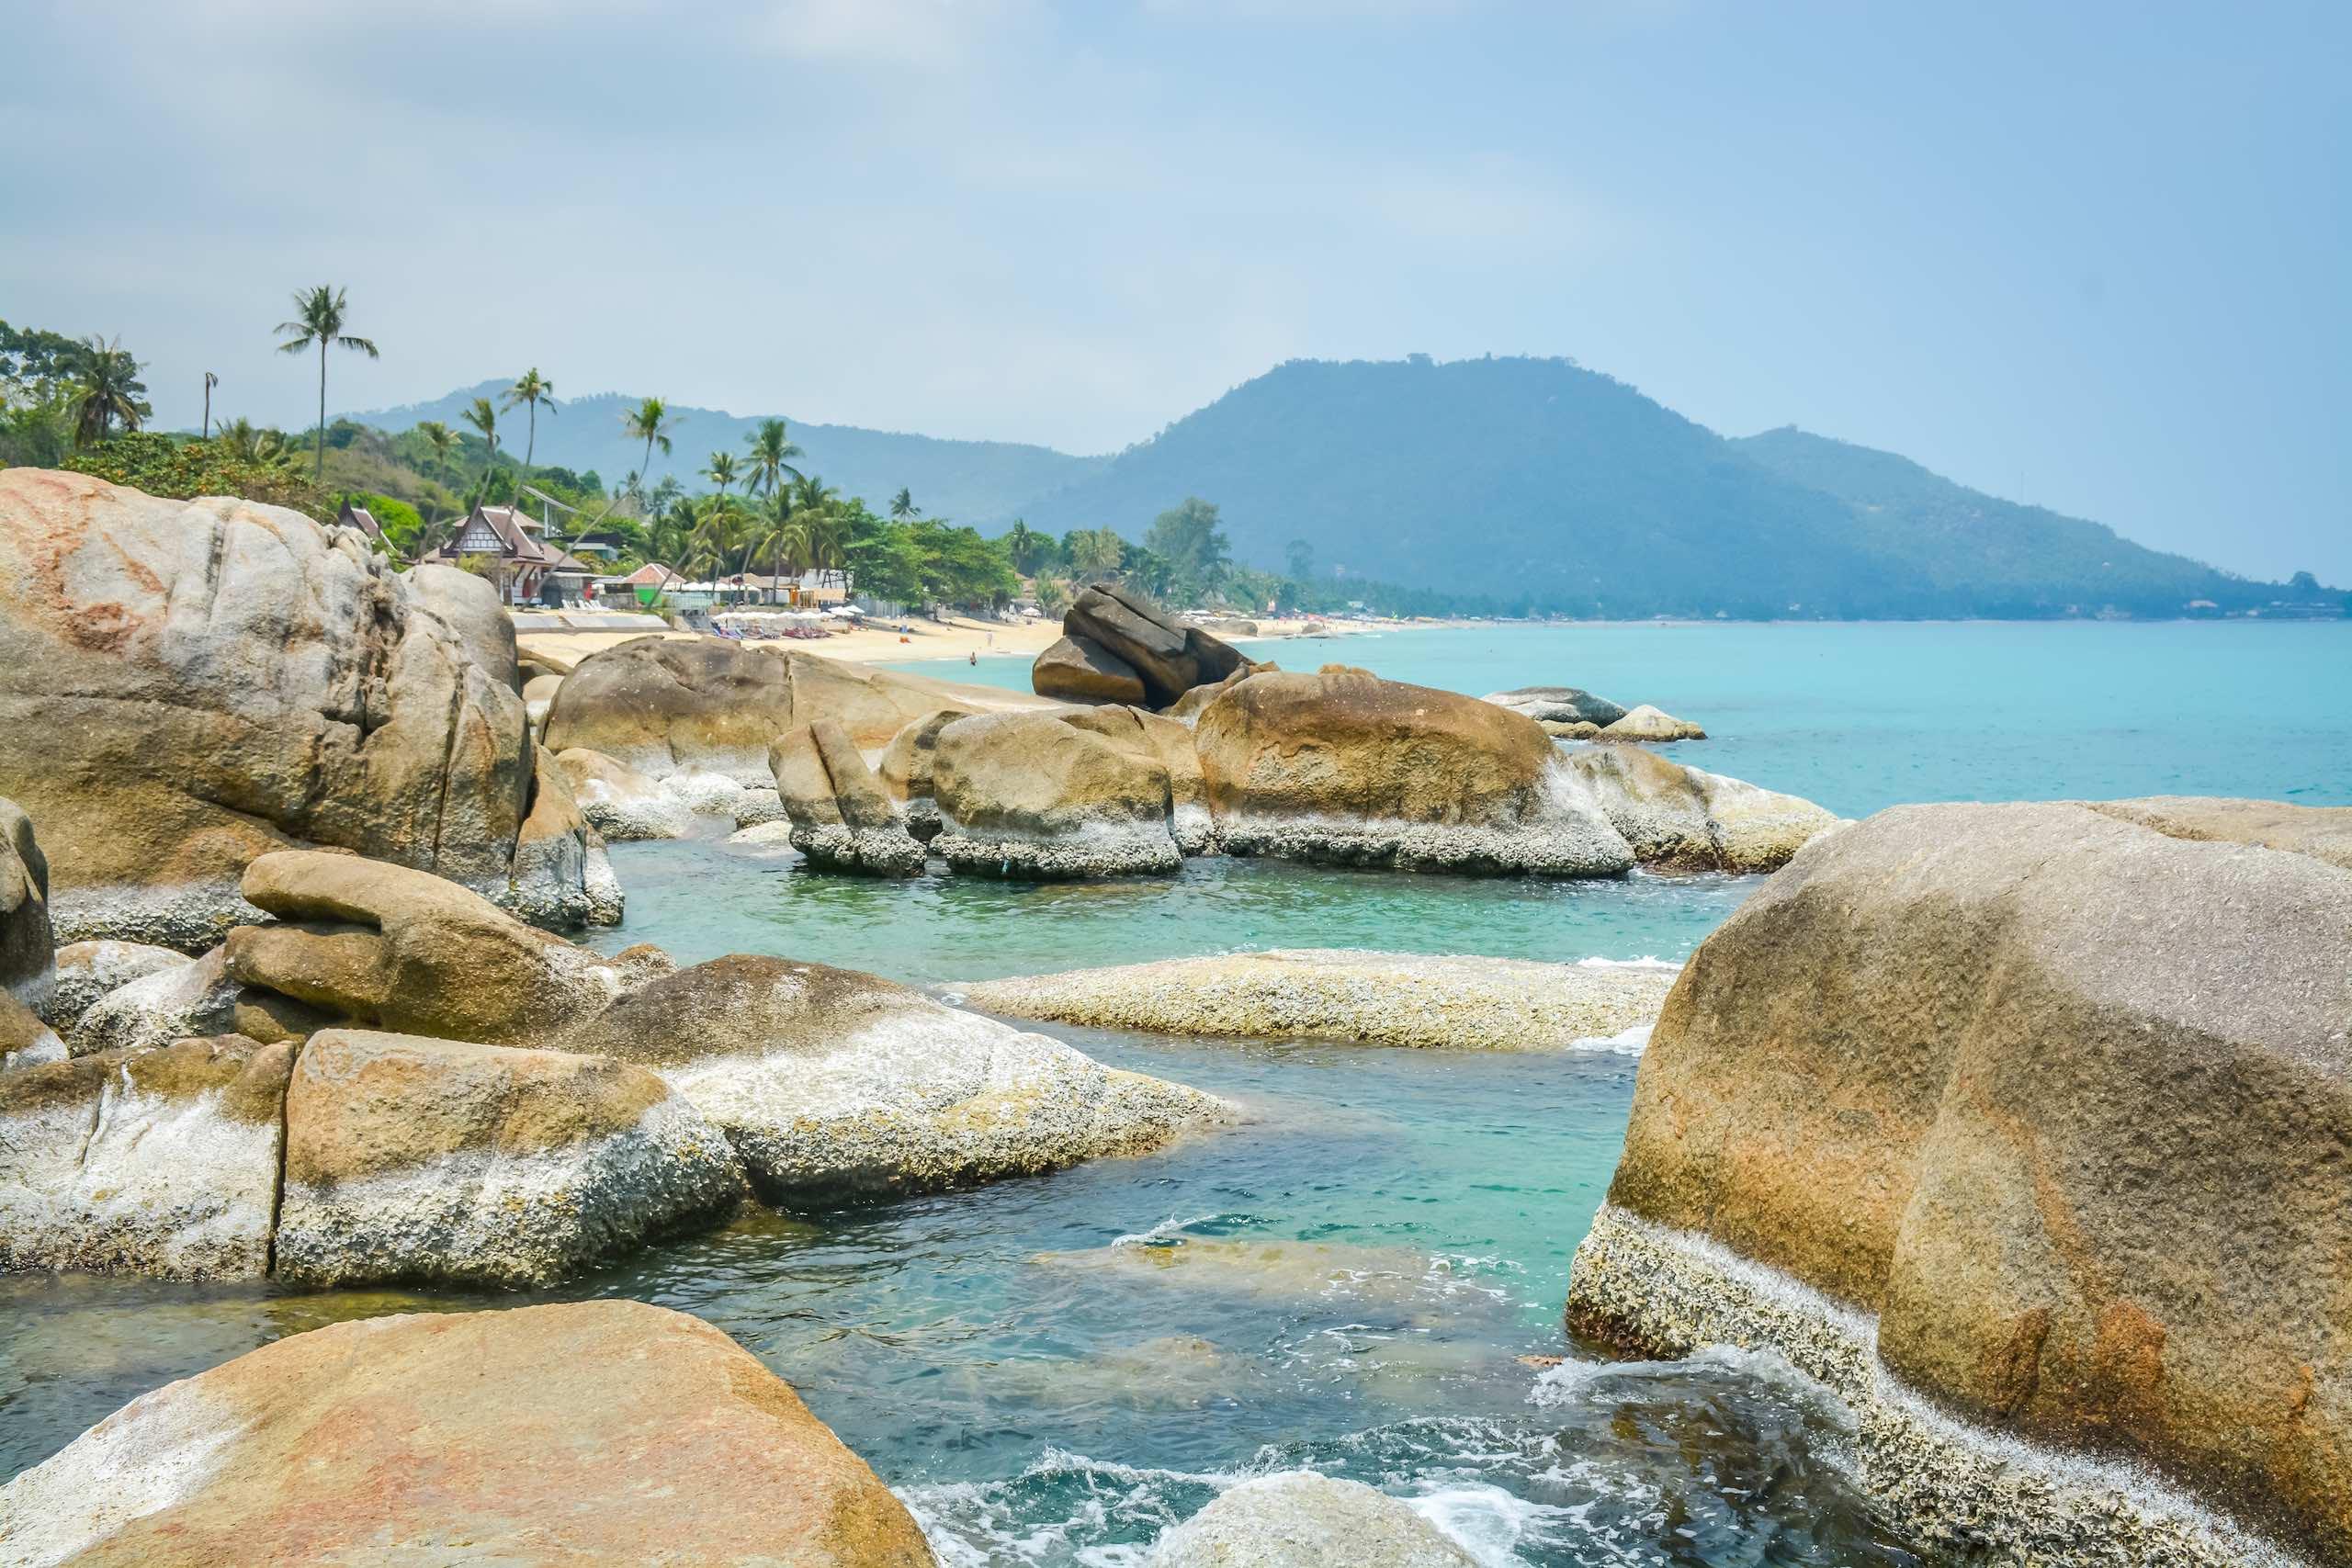 Luxury Holiday Koh Samui Thailand Lamai Beach South